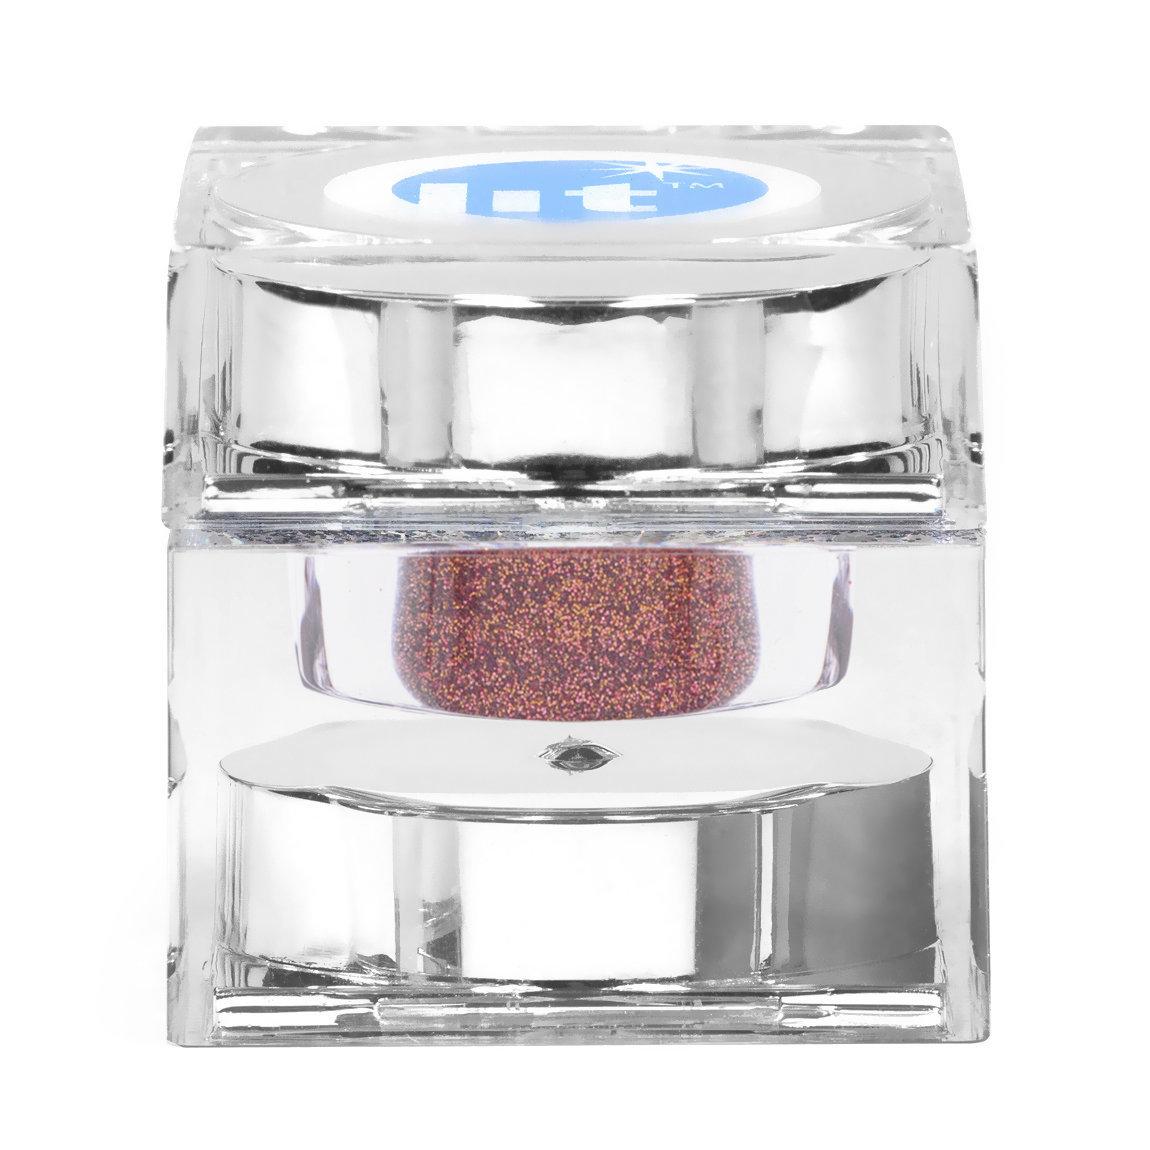 Lit Cosmetics Lit Glitter Express Yourself S2 alternative view 1.